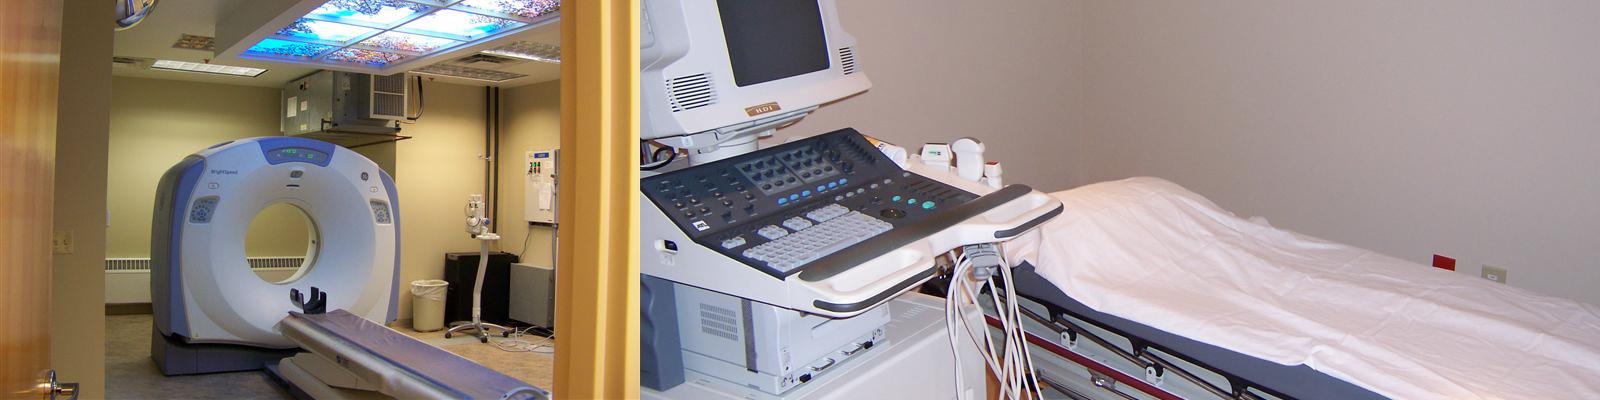 Cook Hospital & Nursing Care Unit image 4